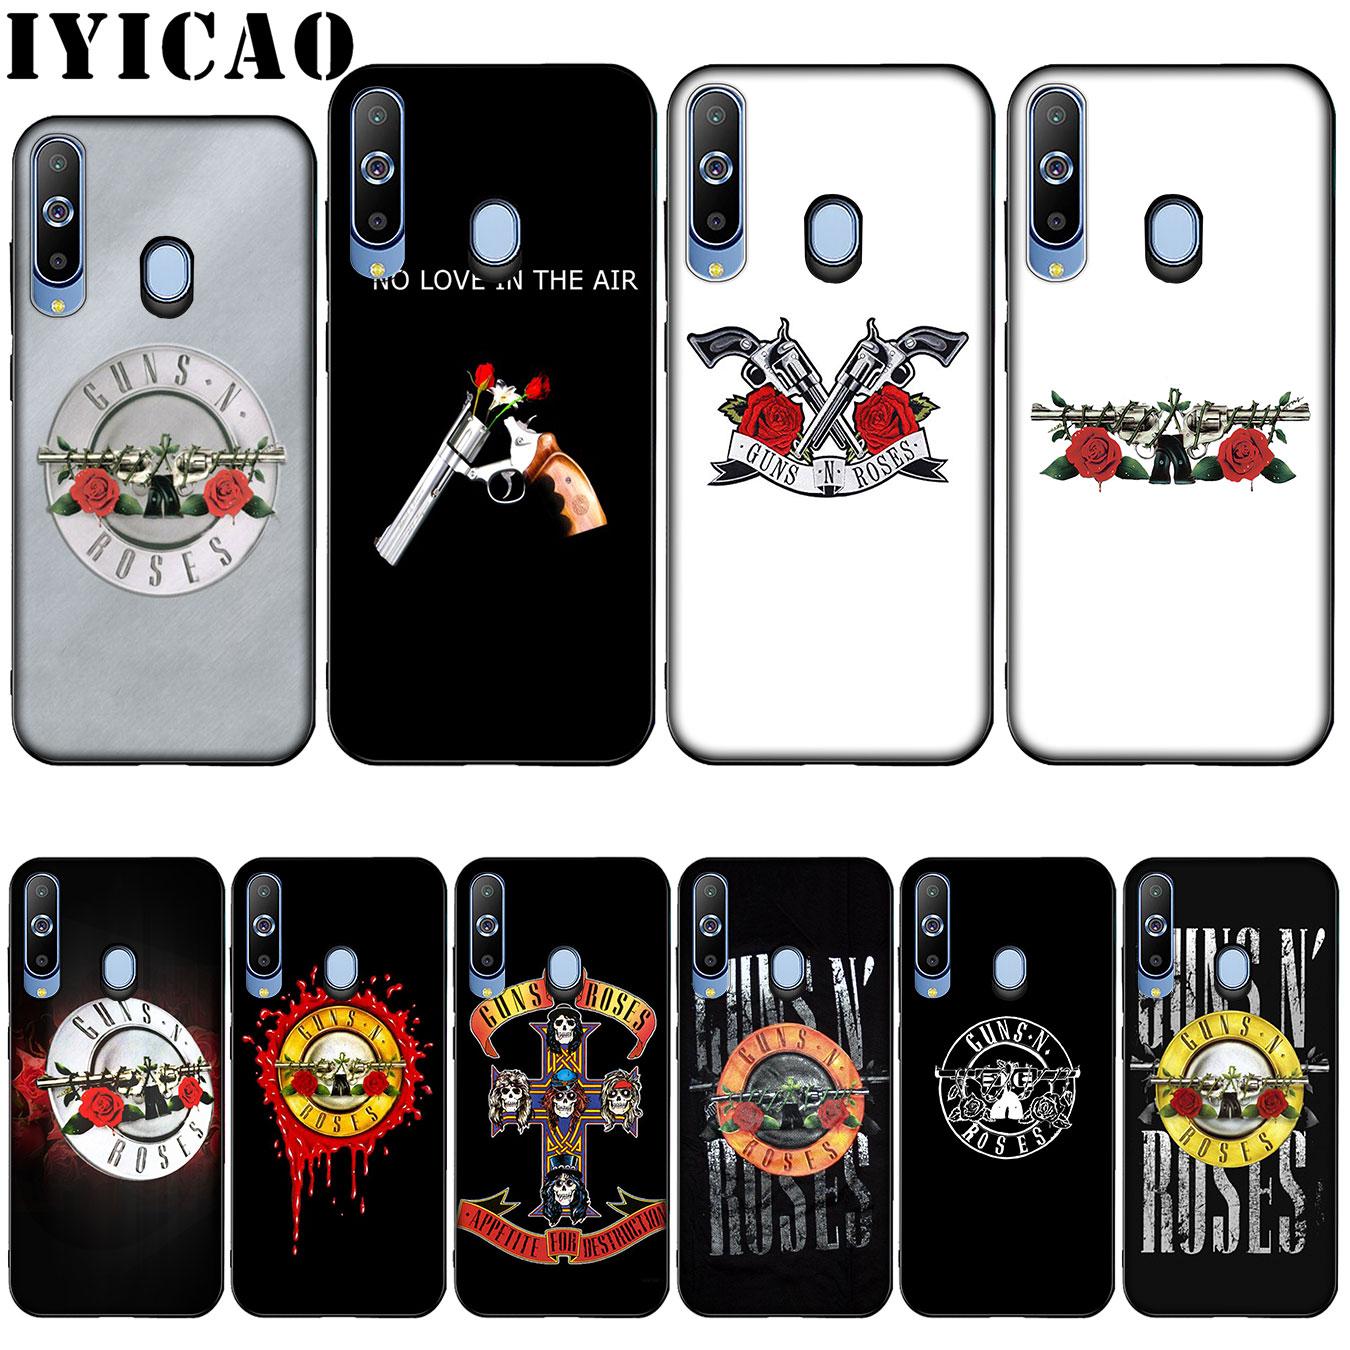 IYICAO guns n roses Silicone Soft Case for Samsung Galaxy A10 A30 A40 A50 A70 M10 M20 M30 Cover